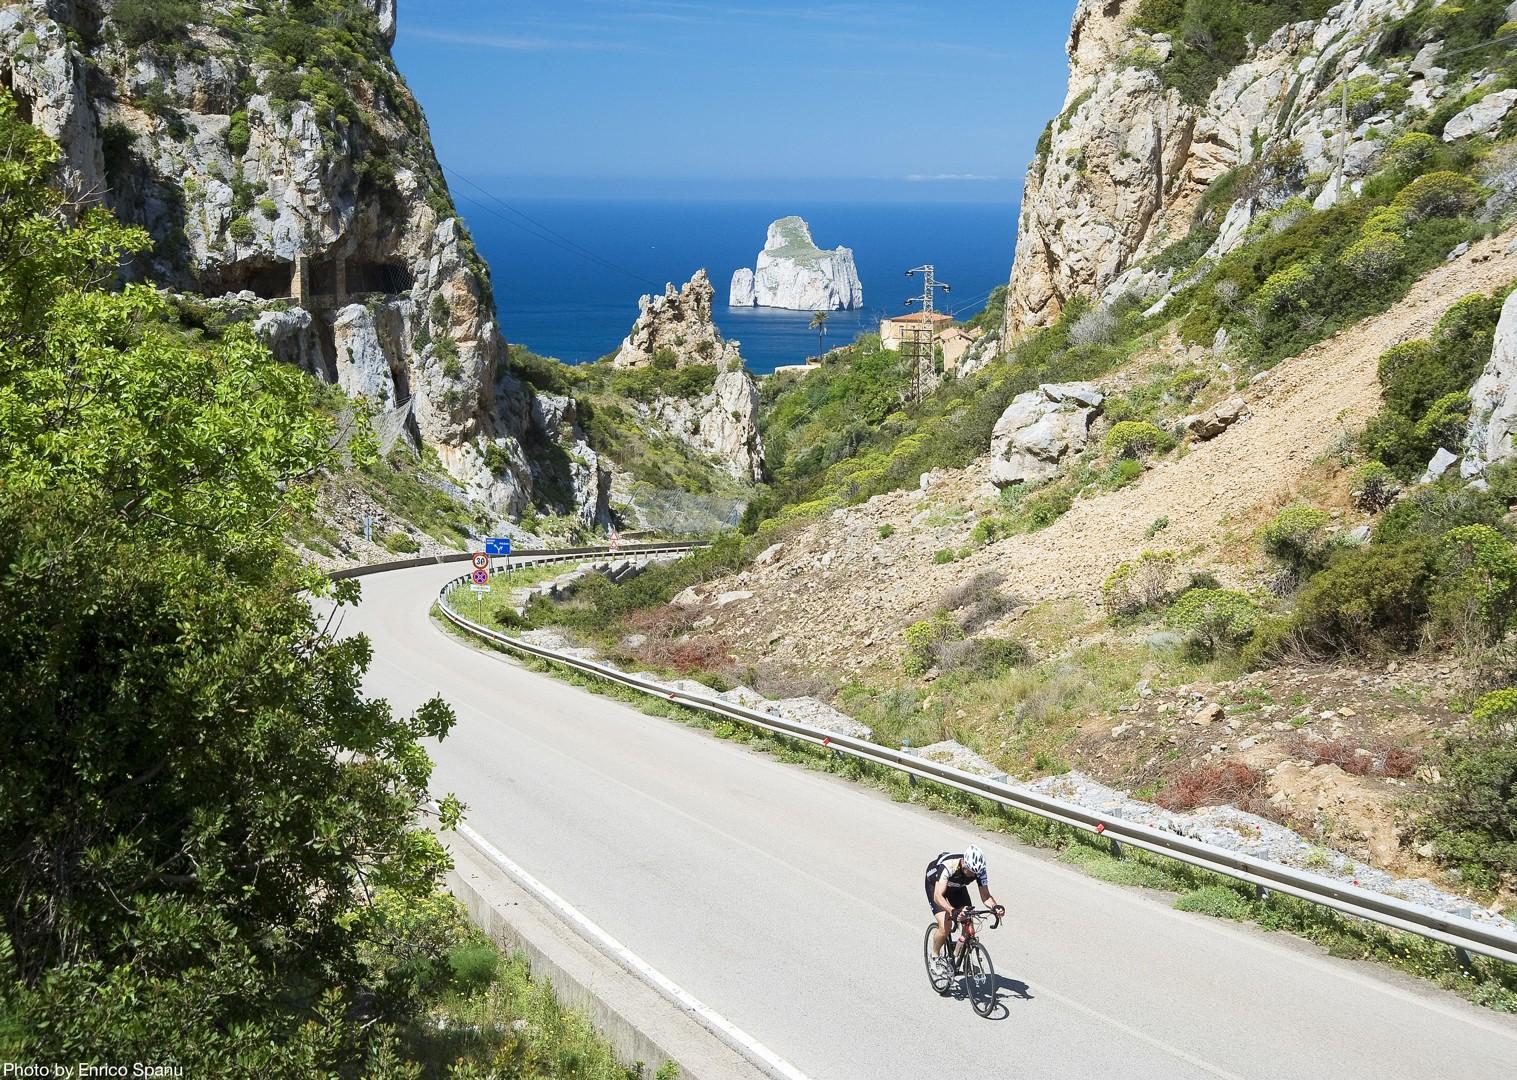 Sardinia-Coastal-Explorer-Self-Guided-Road-Cycling-Holiday.jpg - Italy - Net Trade Rate - Coastal TranSardinia - Self-Guided Road Cycling Holiday - Italia Road Cycling